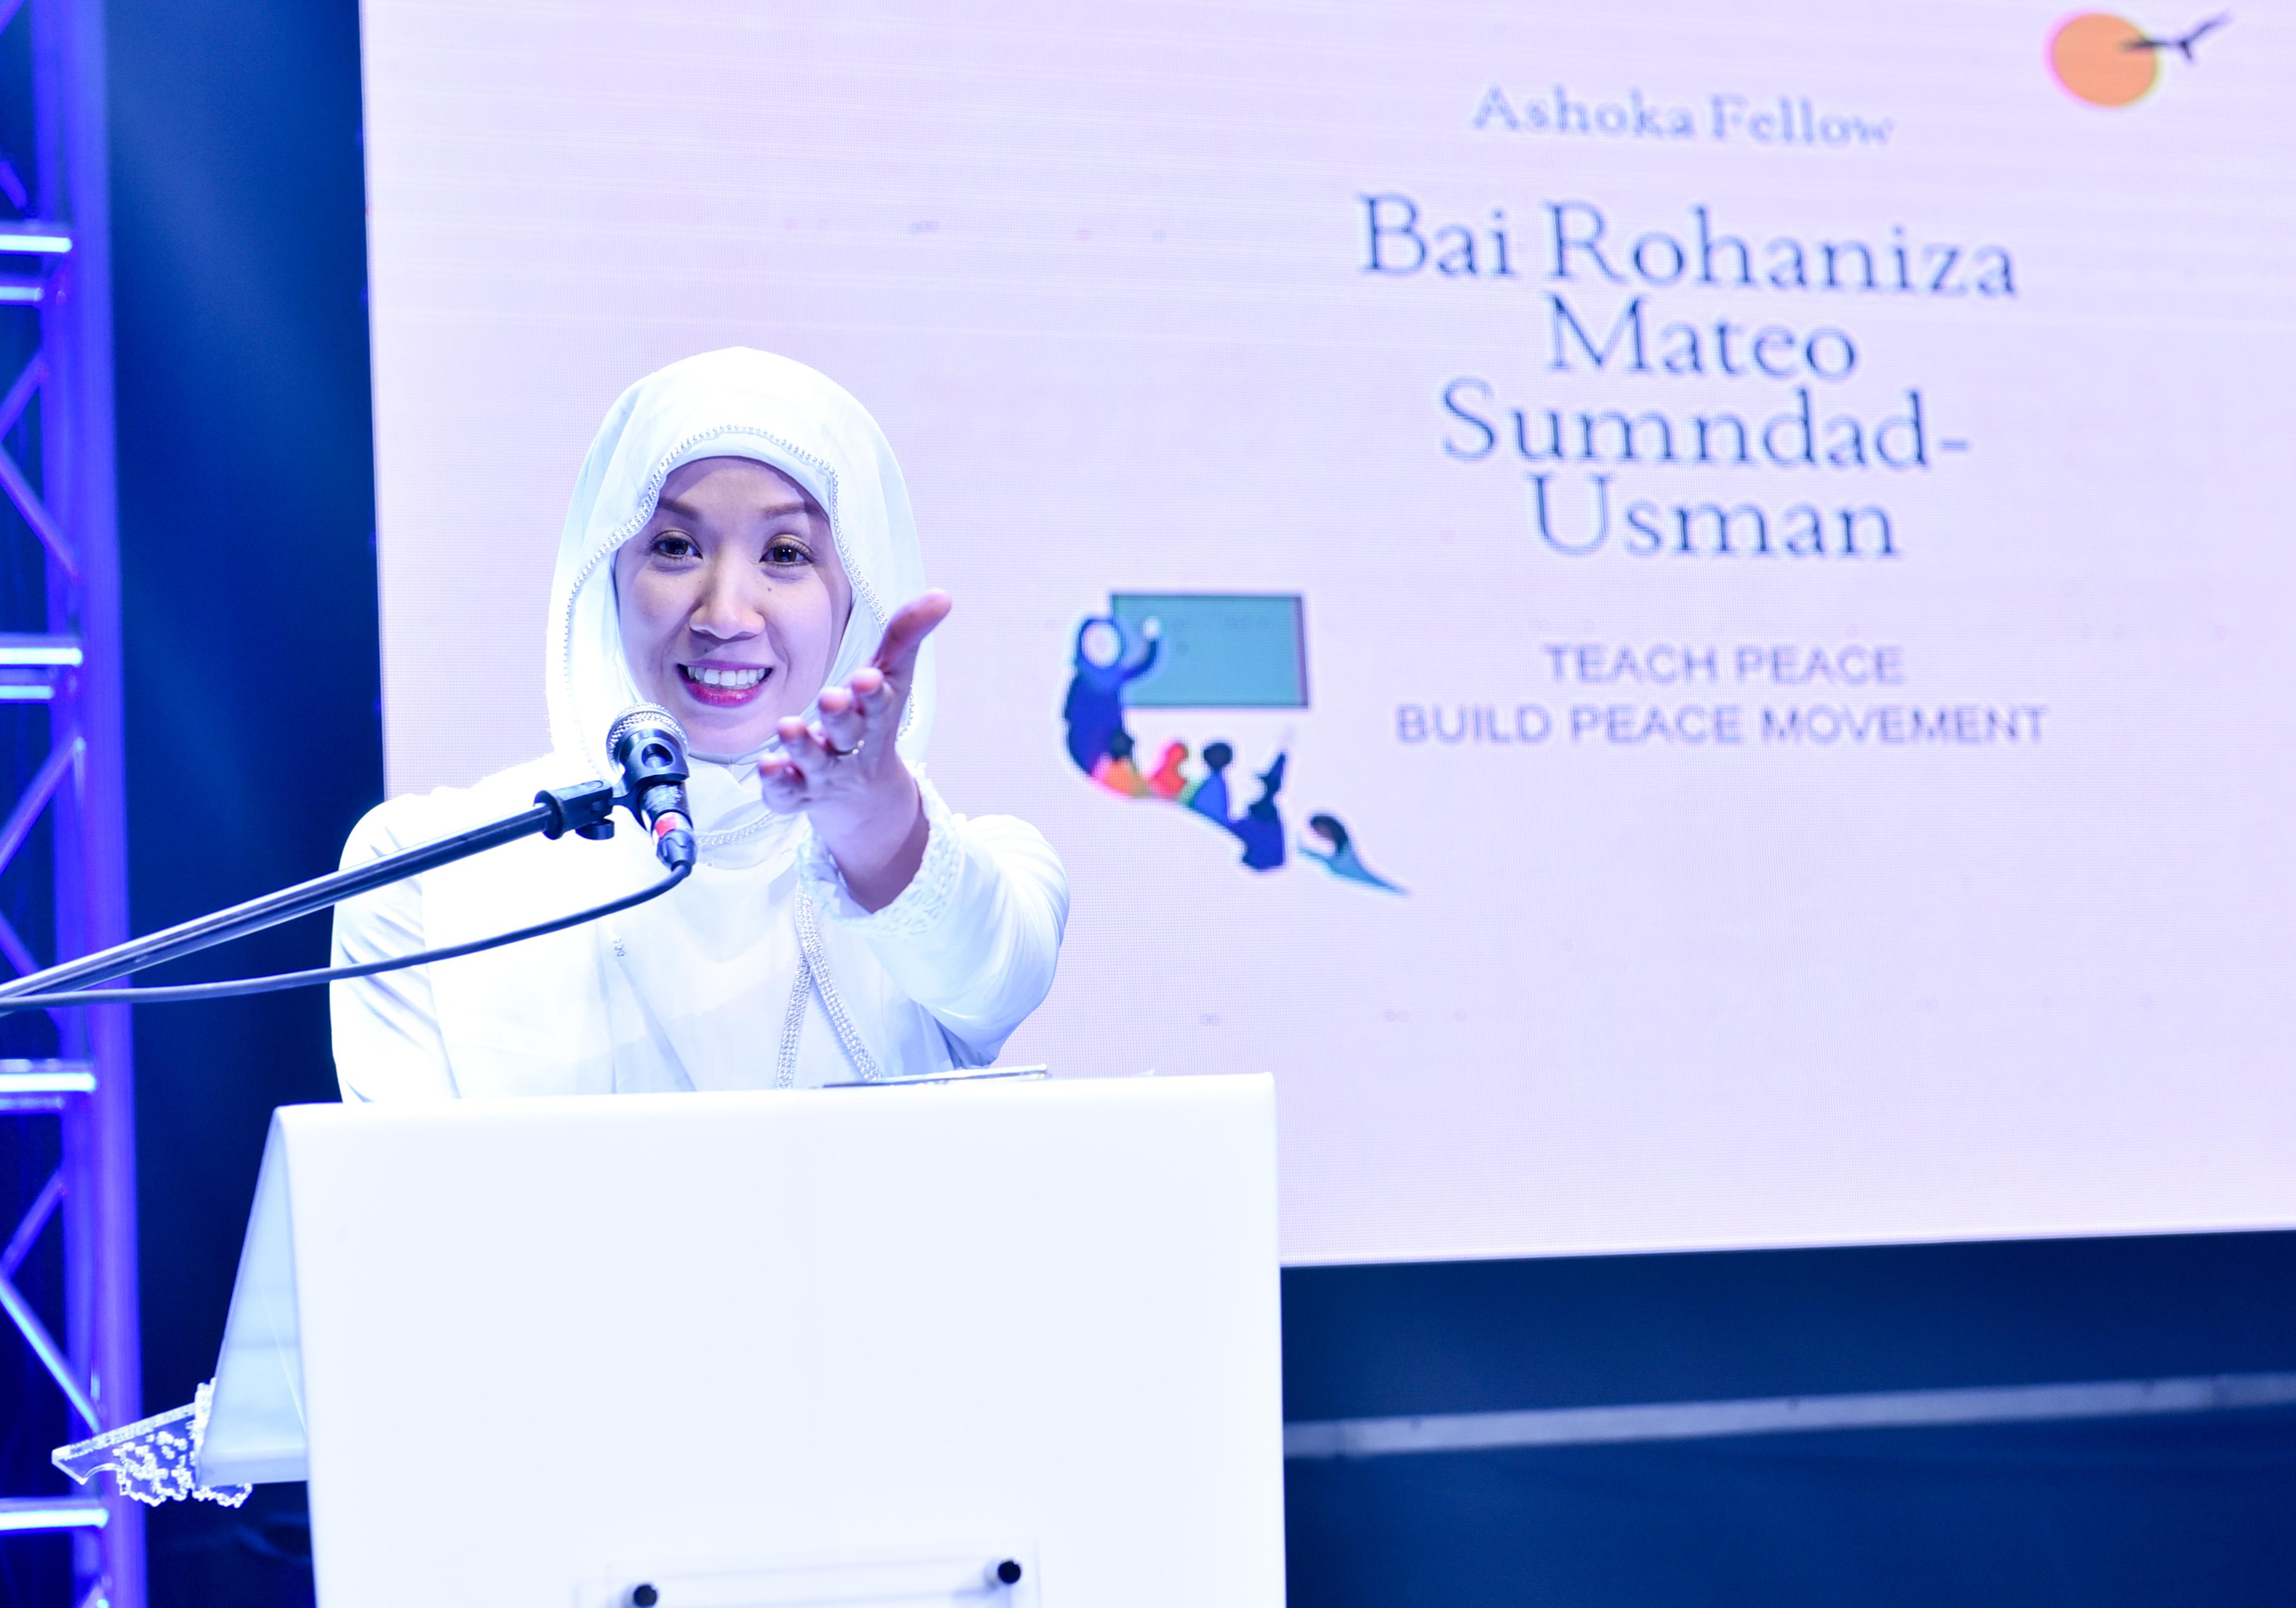 Ashoka Fellow Bai Rohaniza Sumndad-Usman